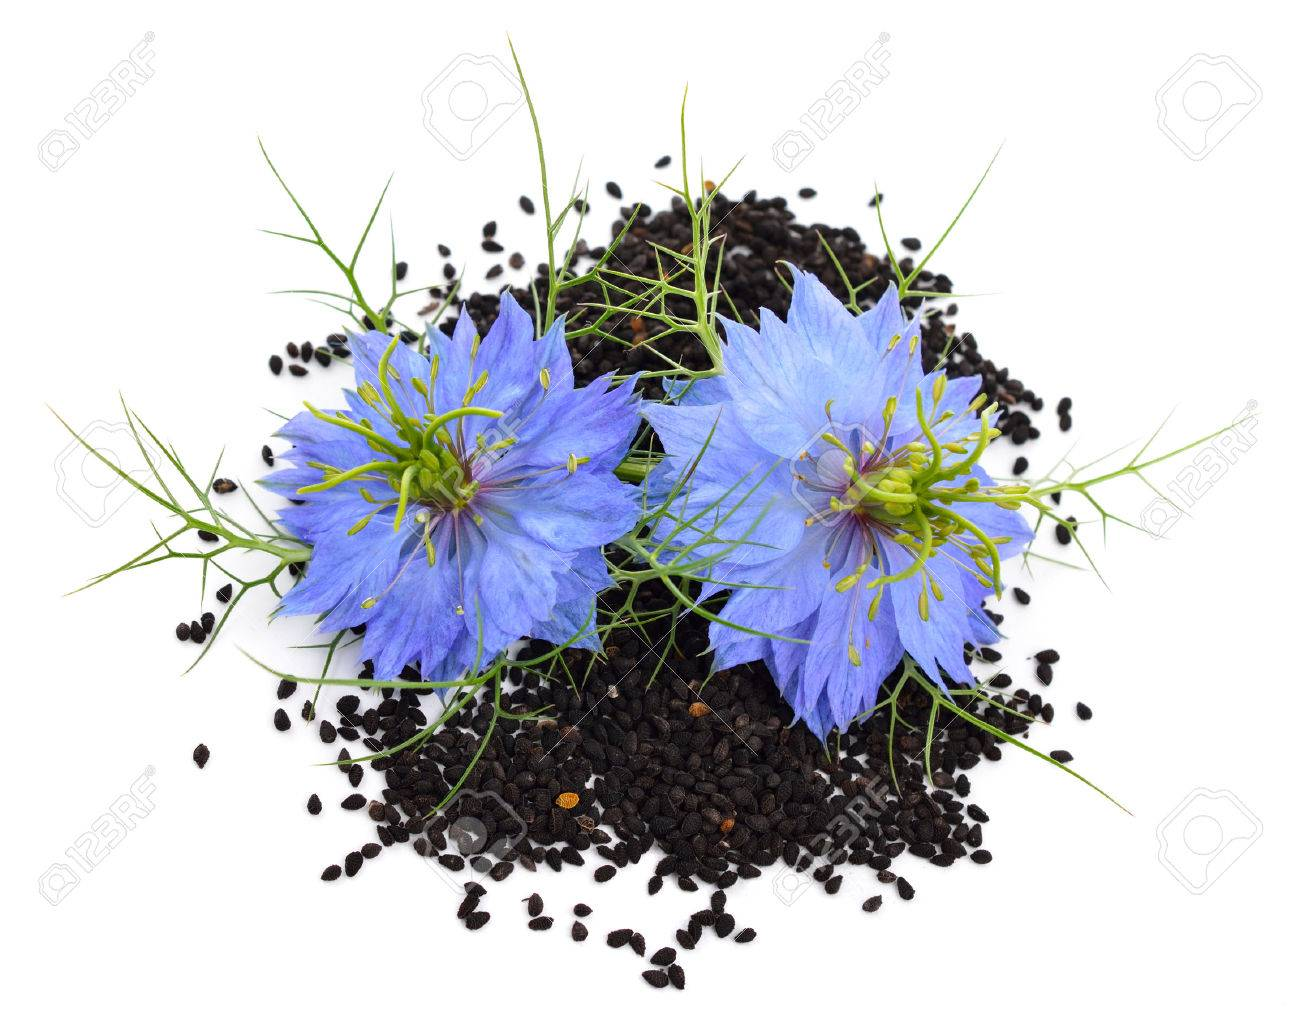 Nigella sativa or fennel flower, nutmeg flower, black caraway, Roman coriander, black cumin, black sesame, blackseed, black caraway, Bunium persicum. Isolated. - 30146995